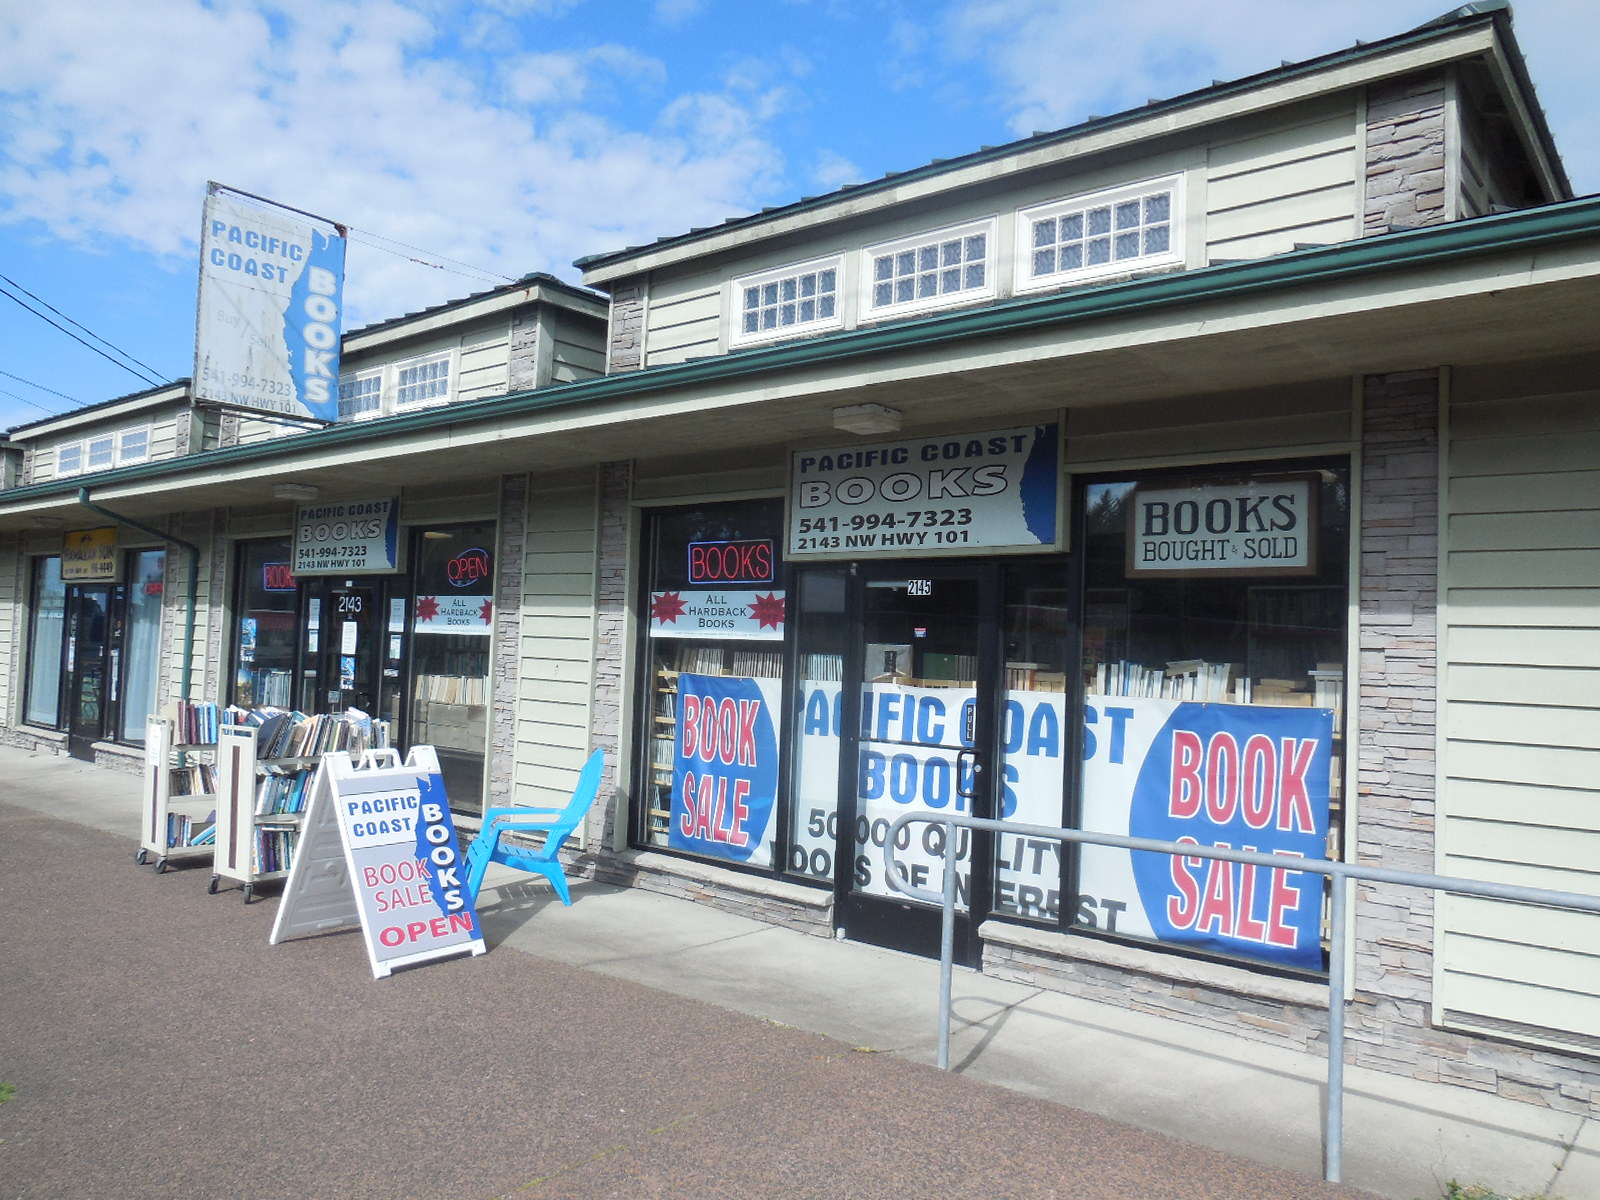 Pacific Coast Books Store Front